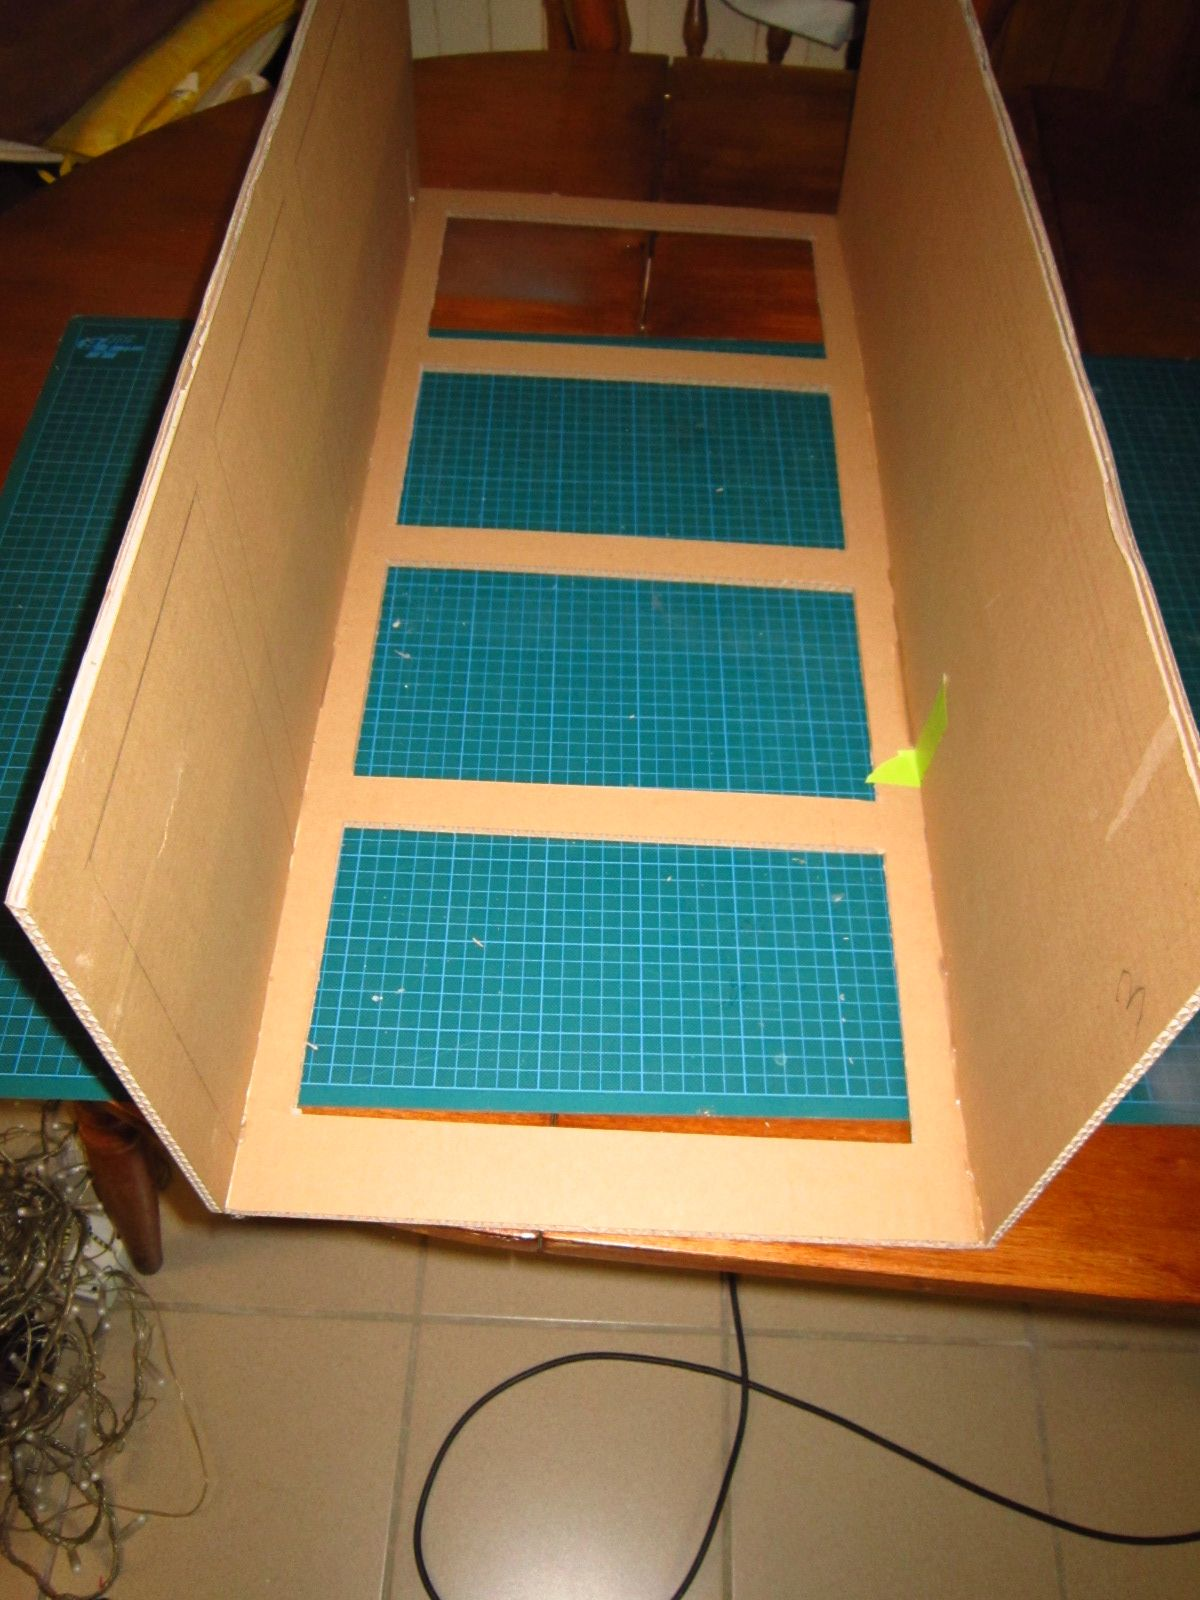 Realiser Un Meuble En Carton Avec La Technique Du Boitage Une Methode De Cartonnistes Pour Fabriquer Meuble En Carton Tuto Meubles En Carton Design En Carton